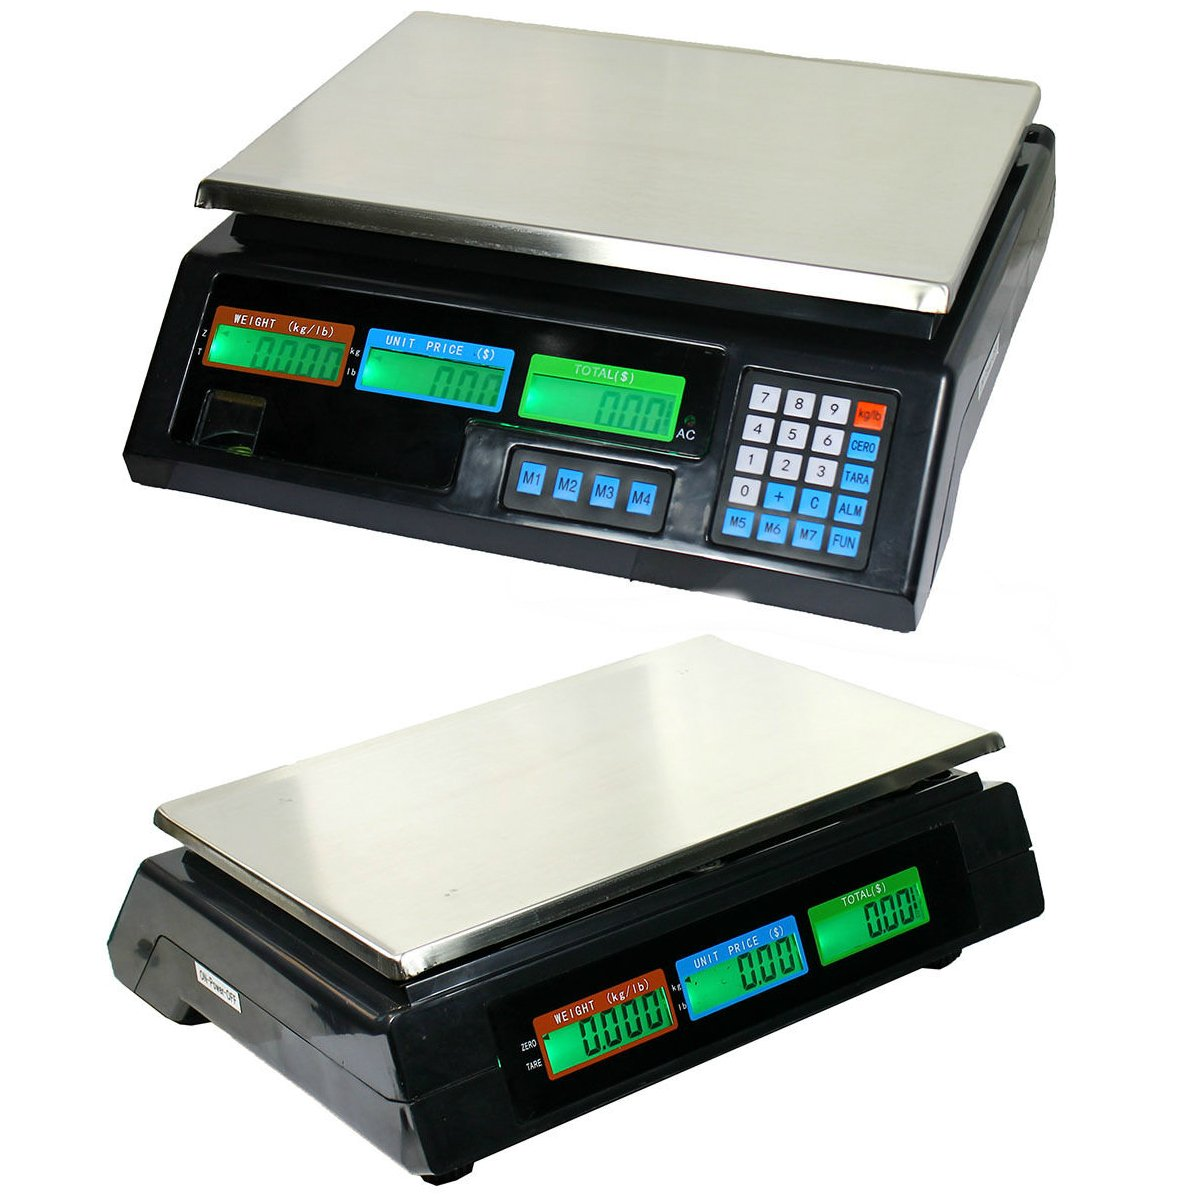 88lbs/40kg Digital Deli Scale | Food Meat Price Computing Digital Weight Scale New by Eosphorus